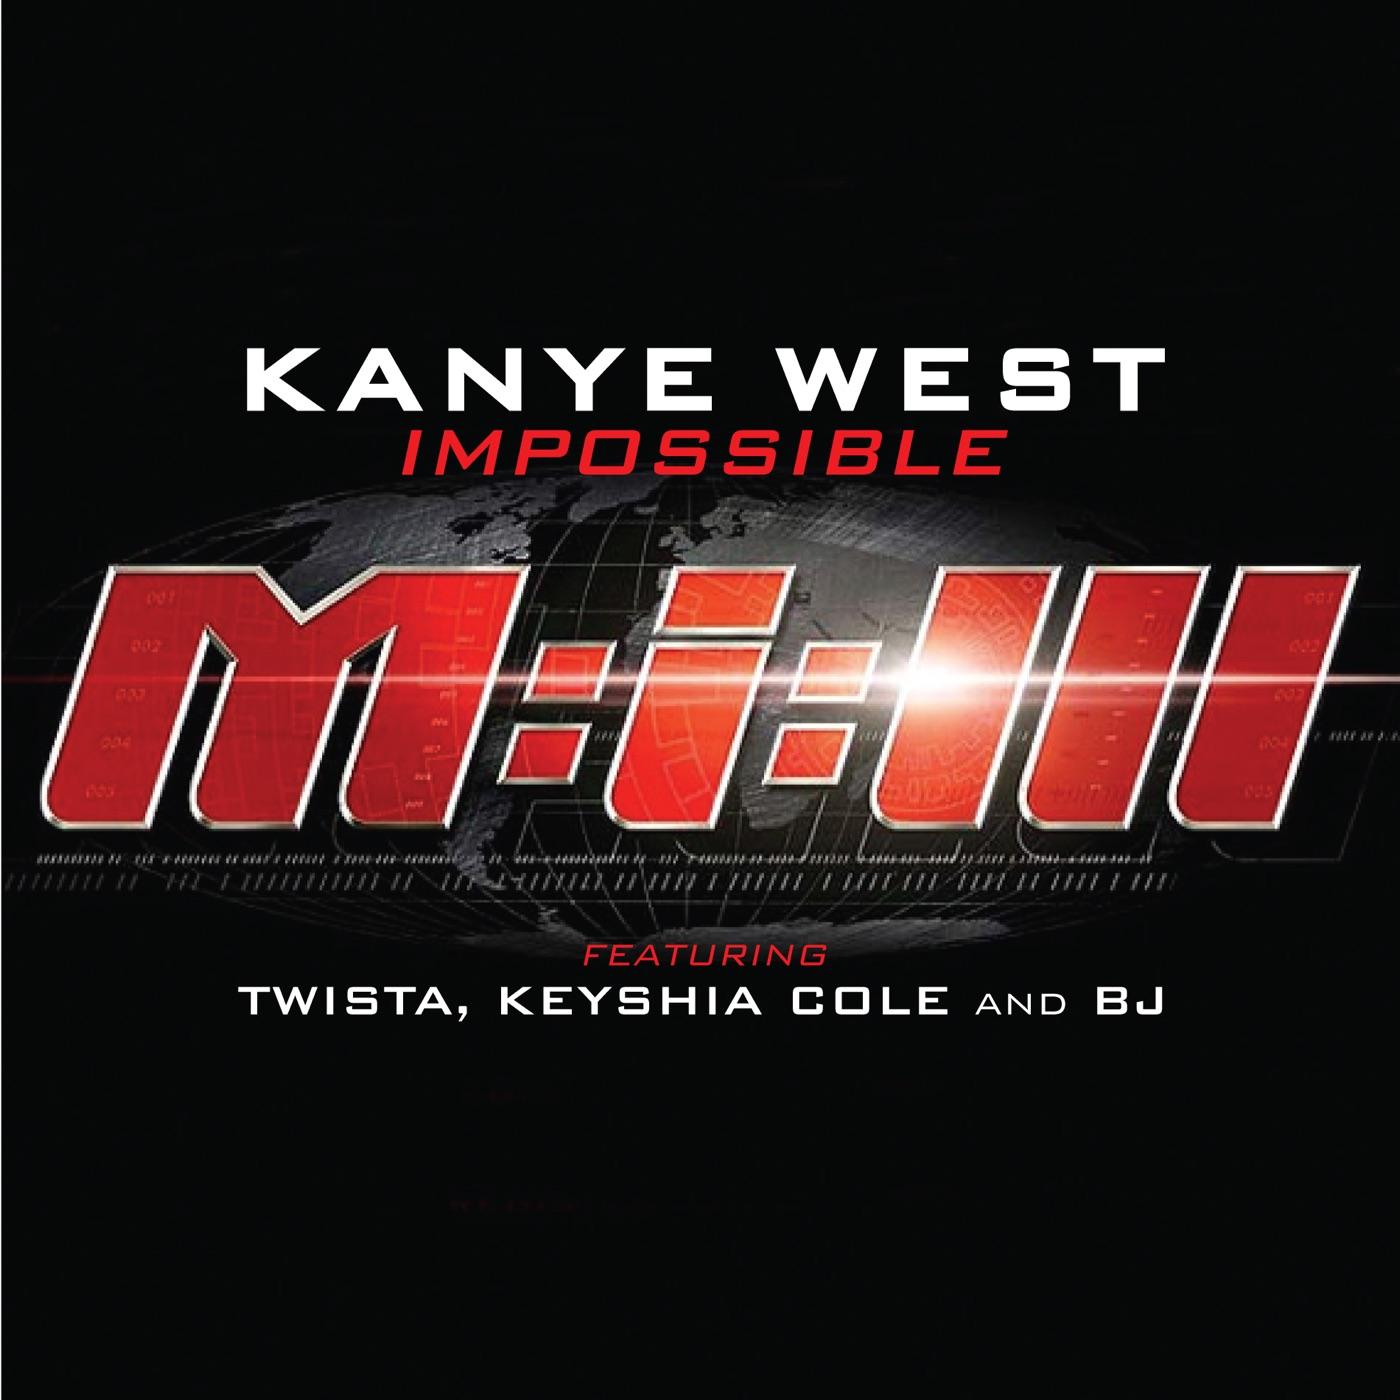 Kanye West featuring Twista, Keyshia Cole & BJ - Impossible (Radio Edit) - Single Cover